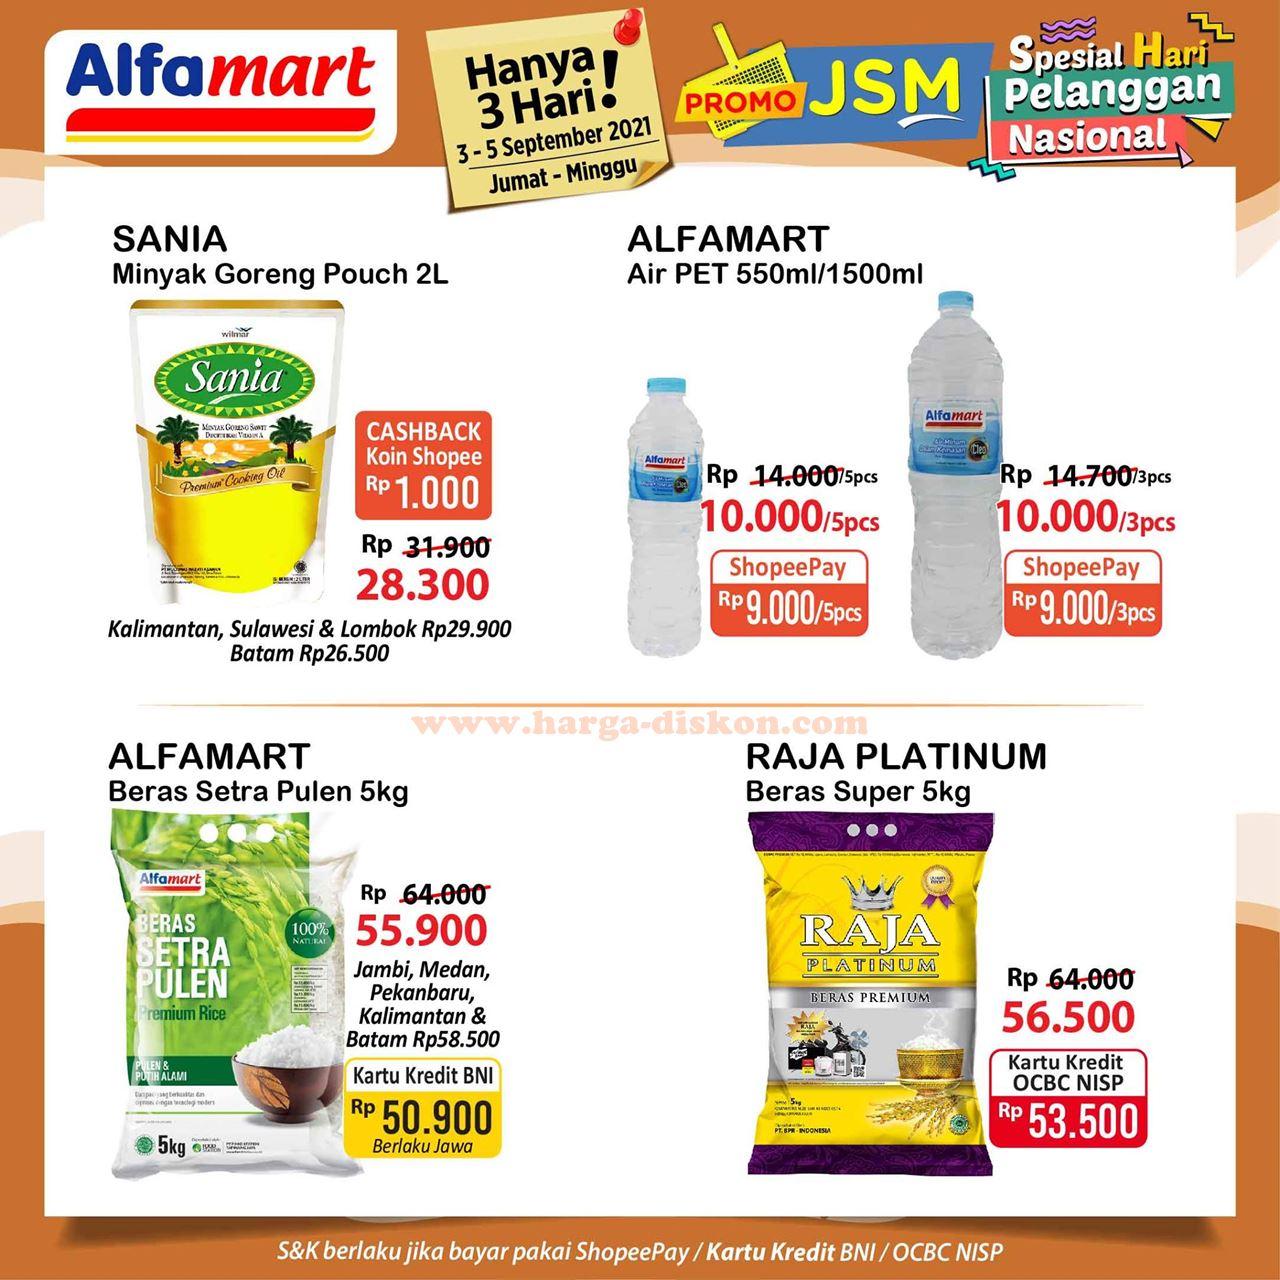 Promo ALFAMART Akhir Pekan Weekend Promo JSM 03 - 05 September 2021